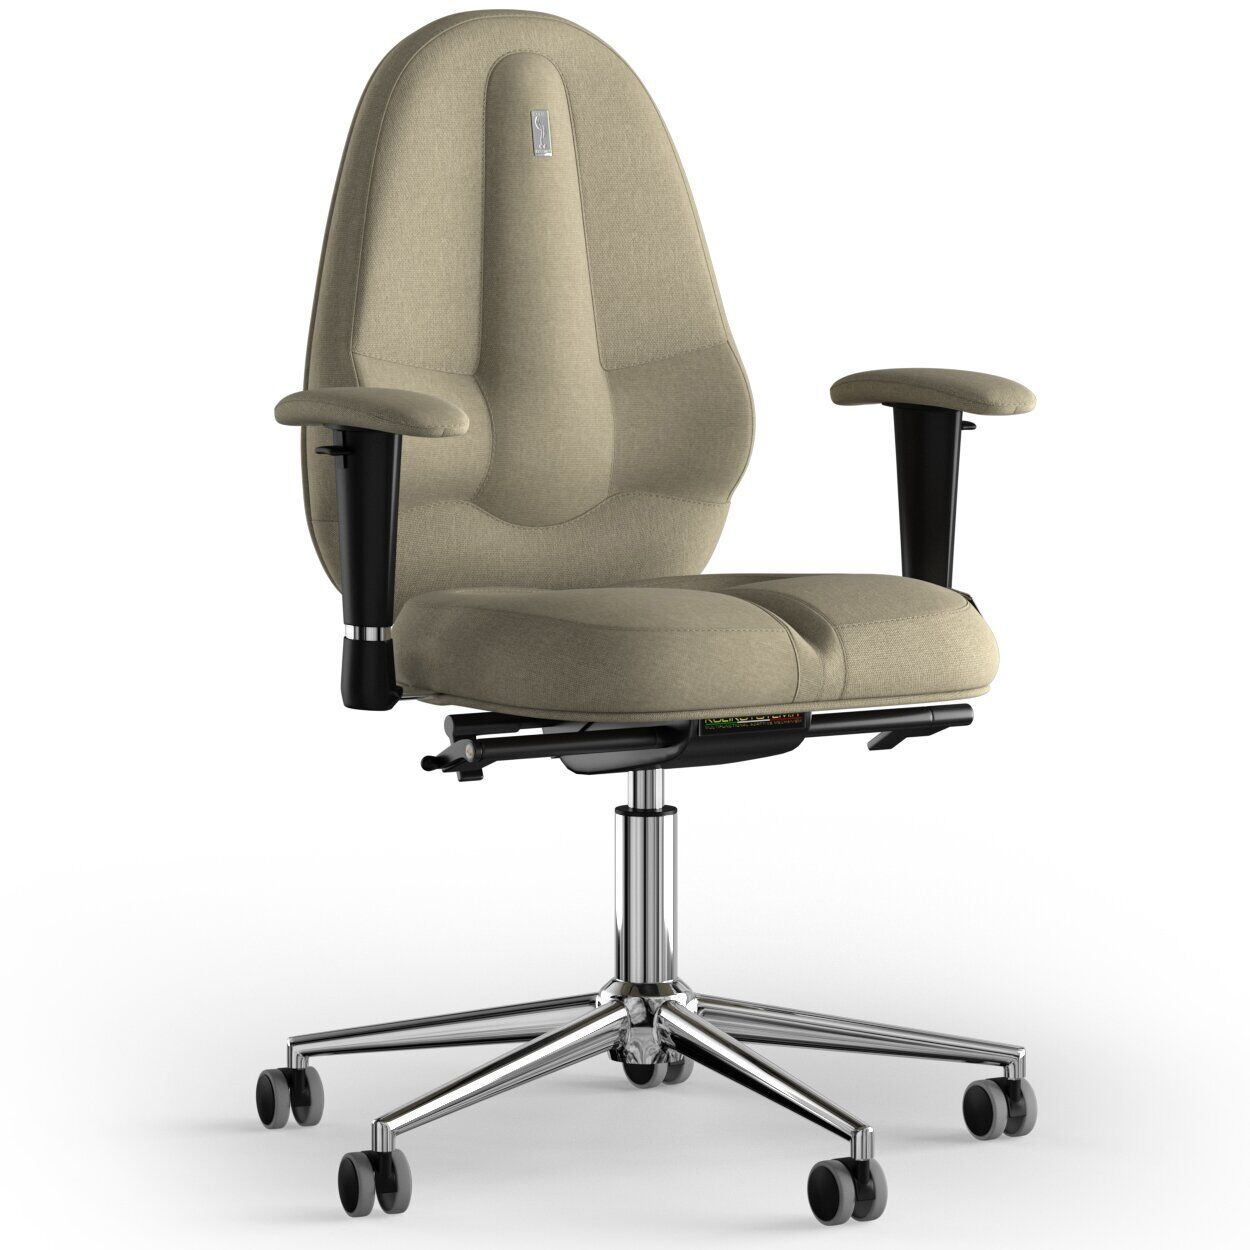 Кресло KULIK SYSTEM CLASSIC Ткань без подголовника без строчки